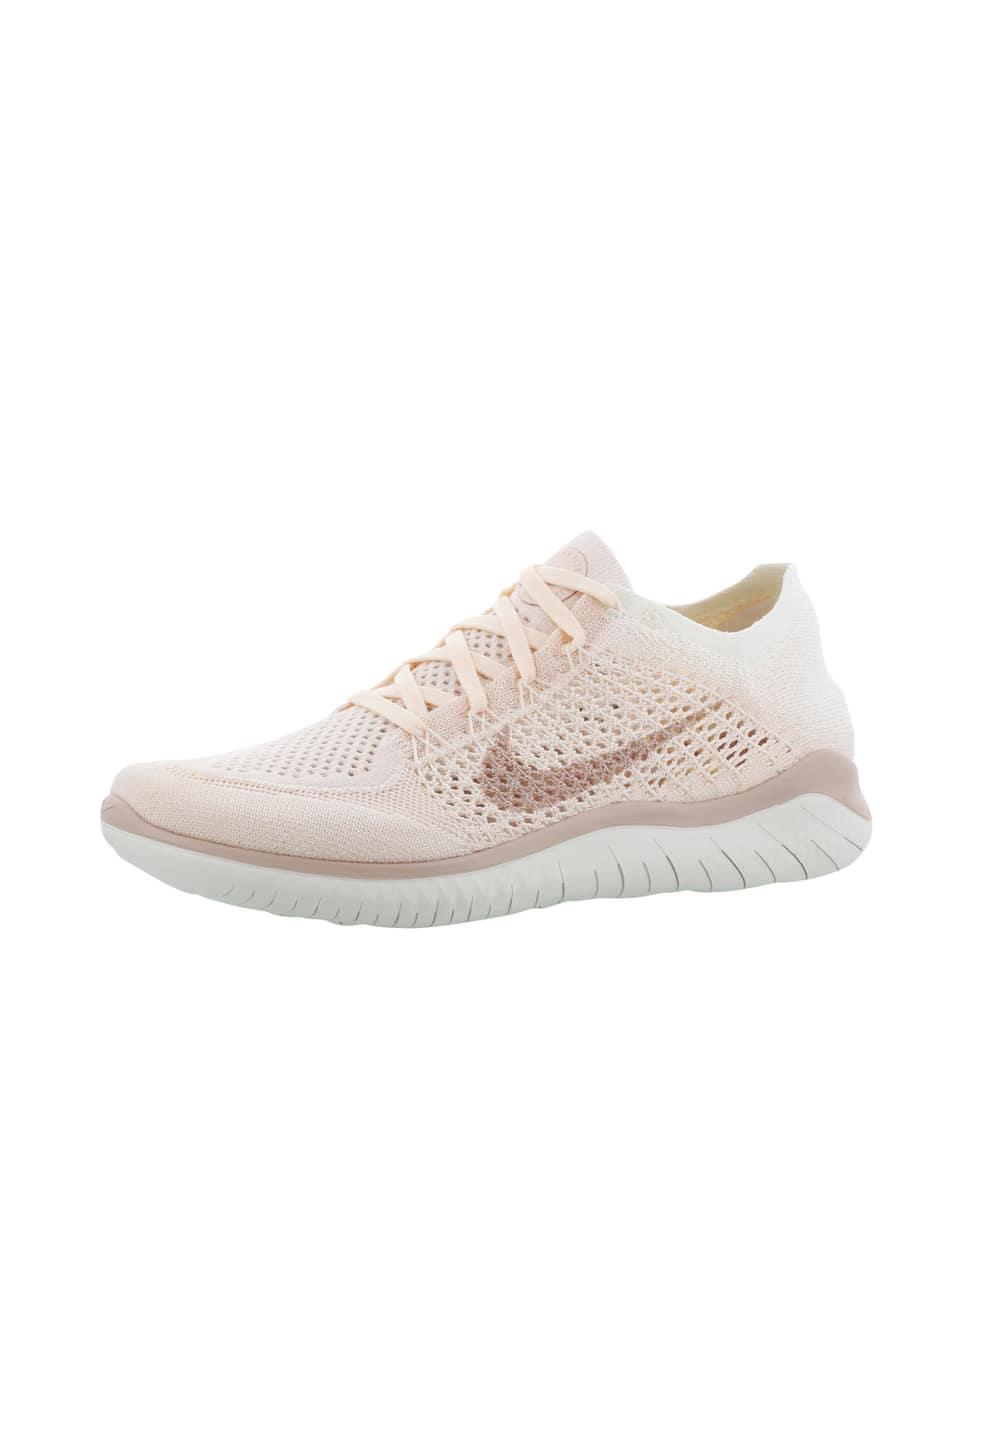 best service 3c924 bafa3 Nike Free RN Flyknit 2018 - Zapatillas de running para Mujer - Rosa